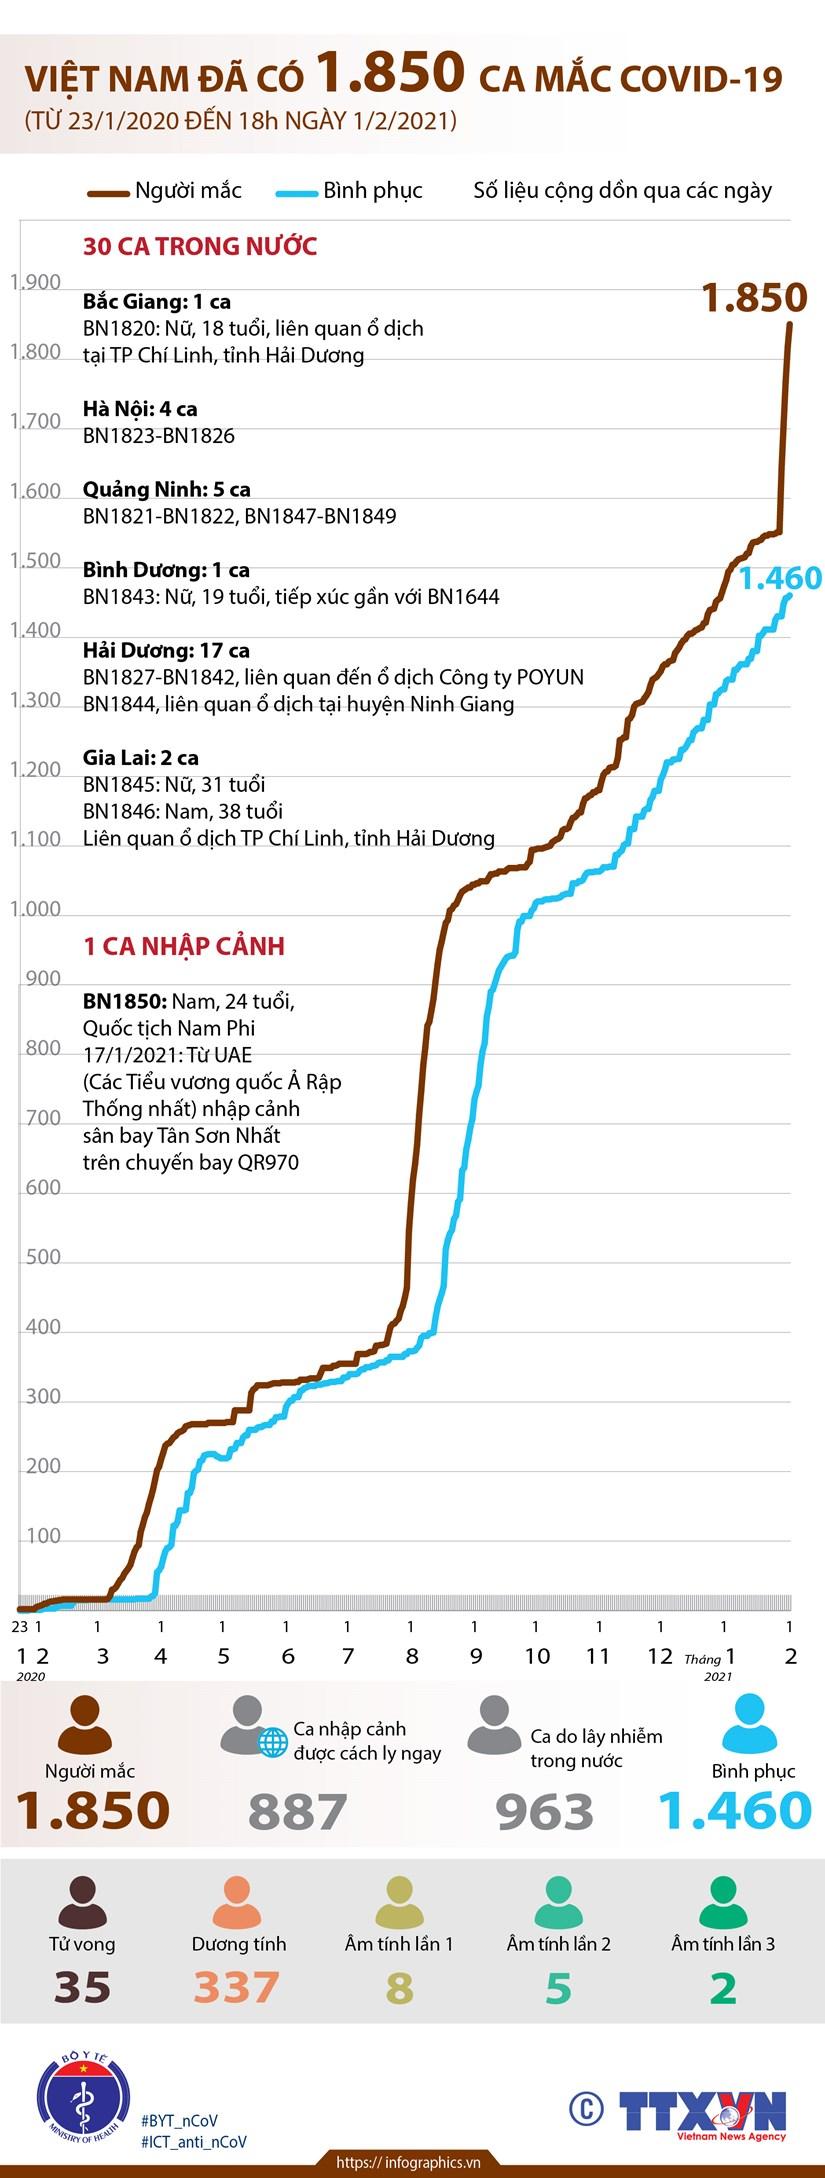 [Infographics] Viet Nam da ghi nhan 1.850 ca mac COVID-19 hinh anh 1